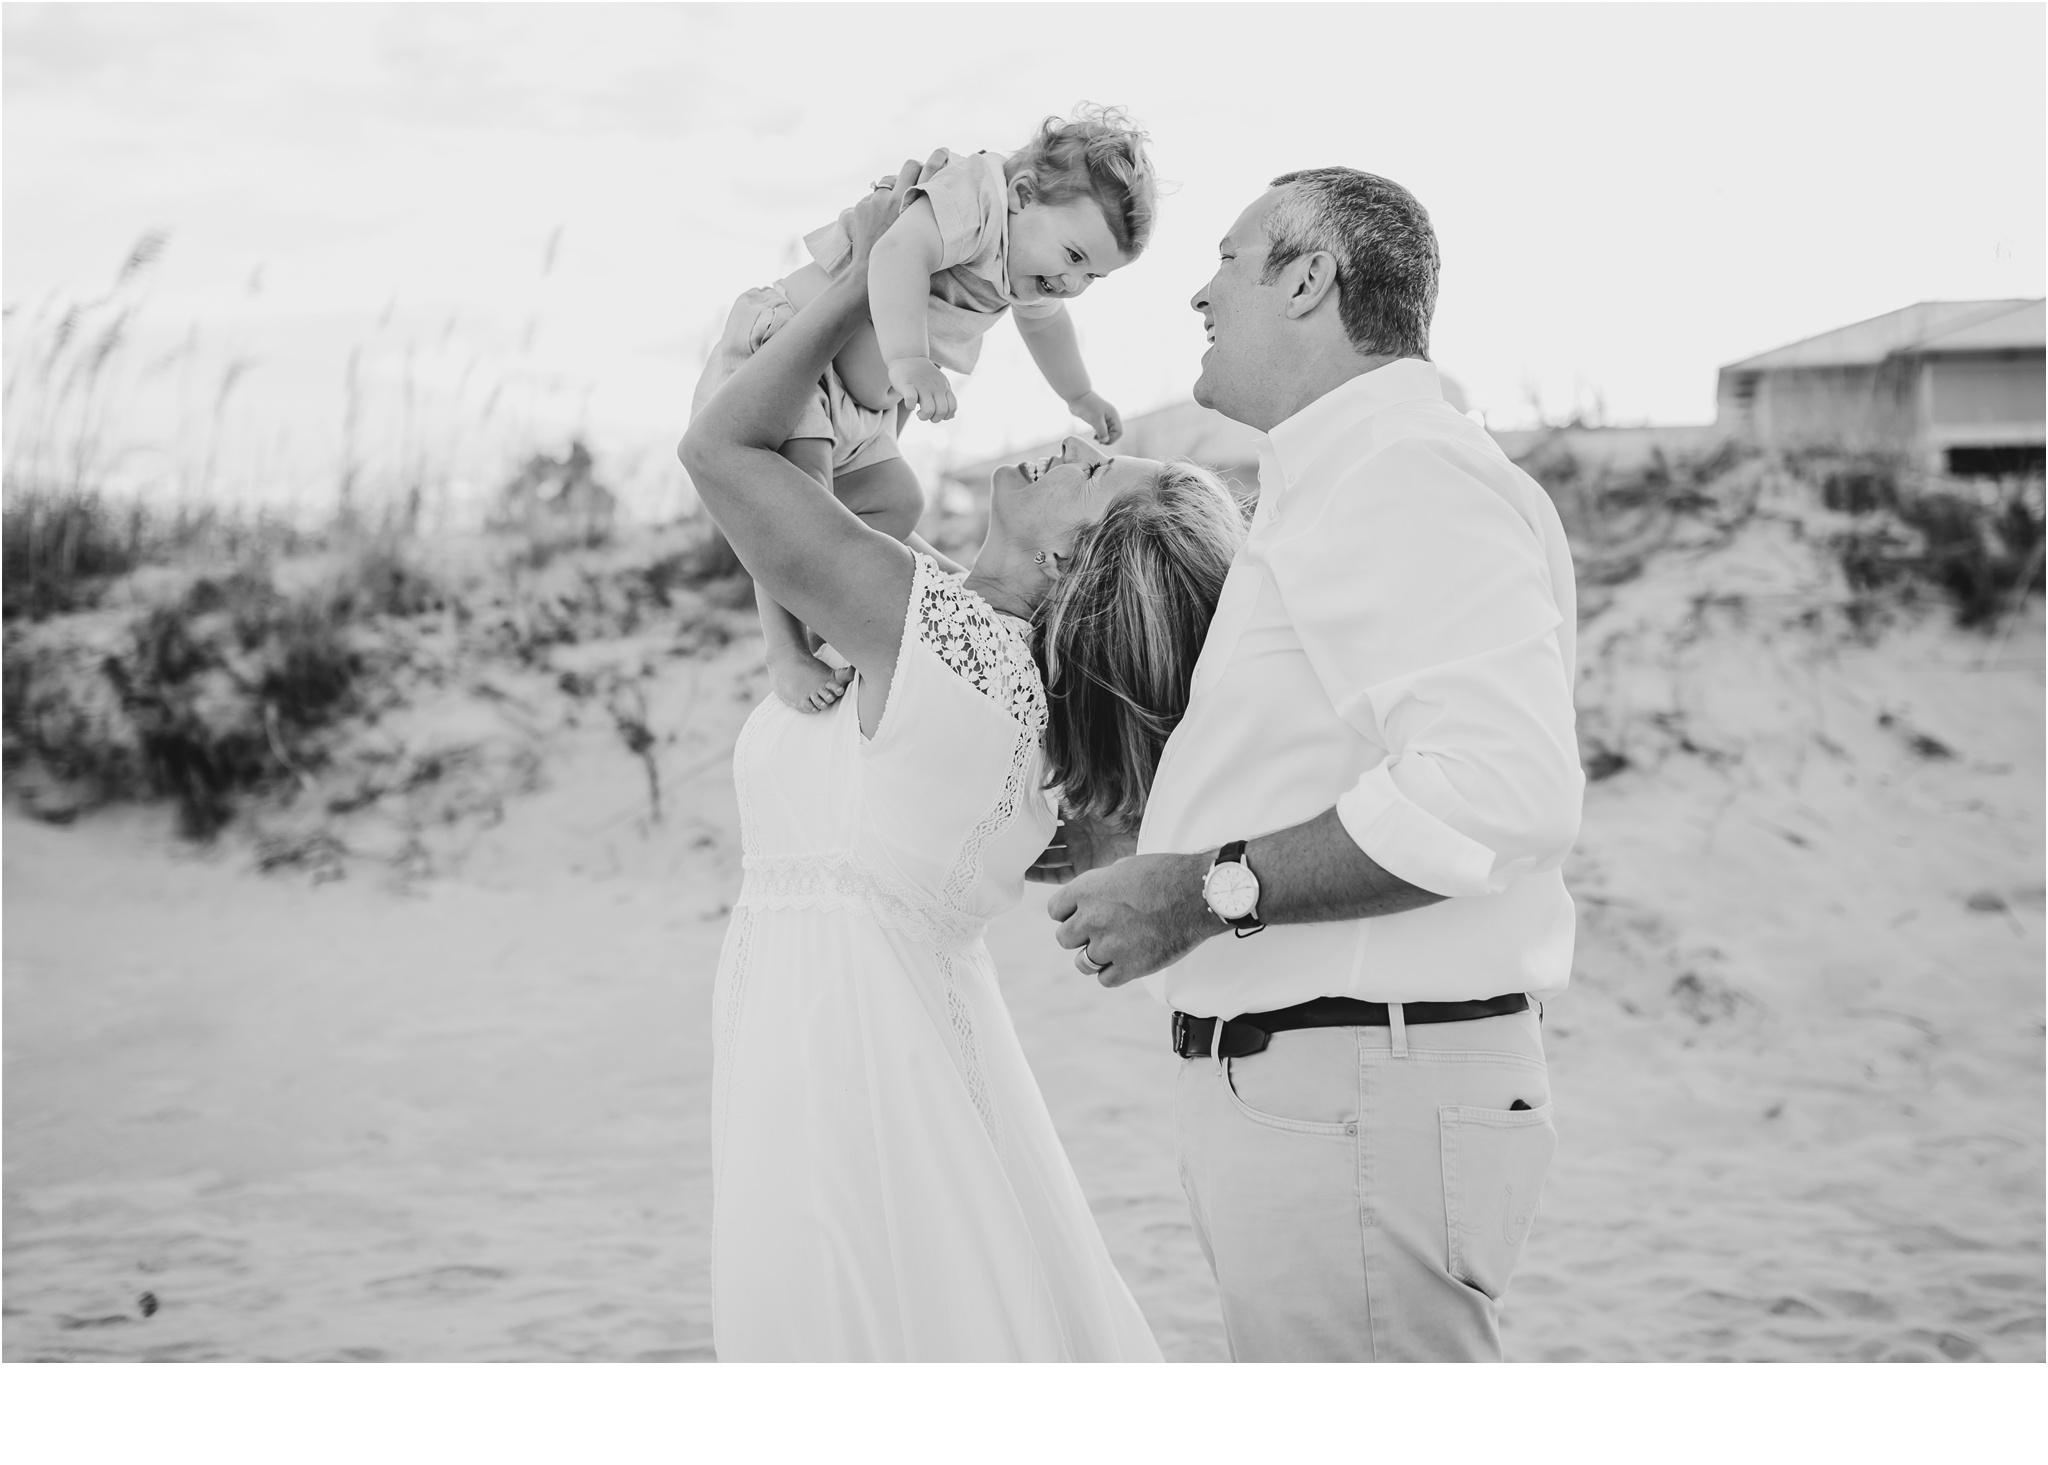 Rainey_Gregg_Photography_St._Simons_Island_Georgia_California_Wedding_Portrait_Photography_1027.jpg